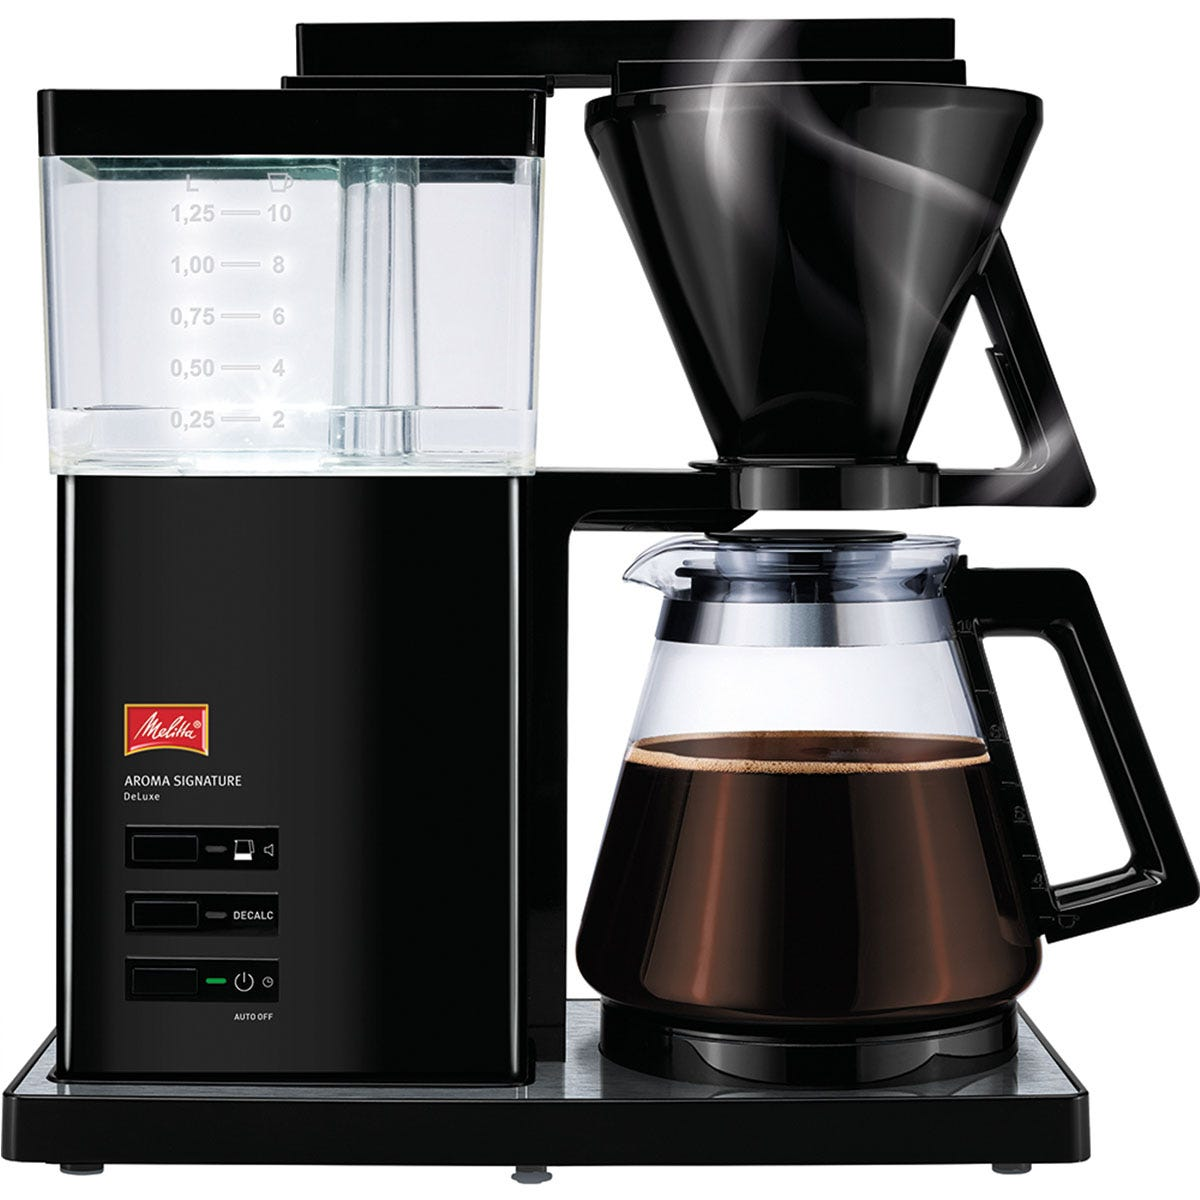 Melitta 6764396 Aroma Signature Deluxe 1800W Filter Coffee Machine- Black